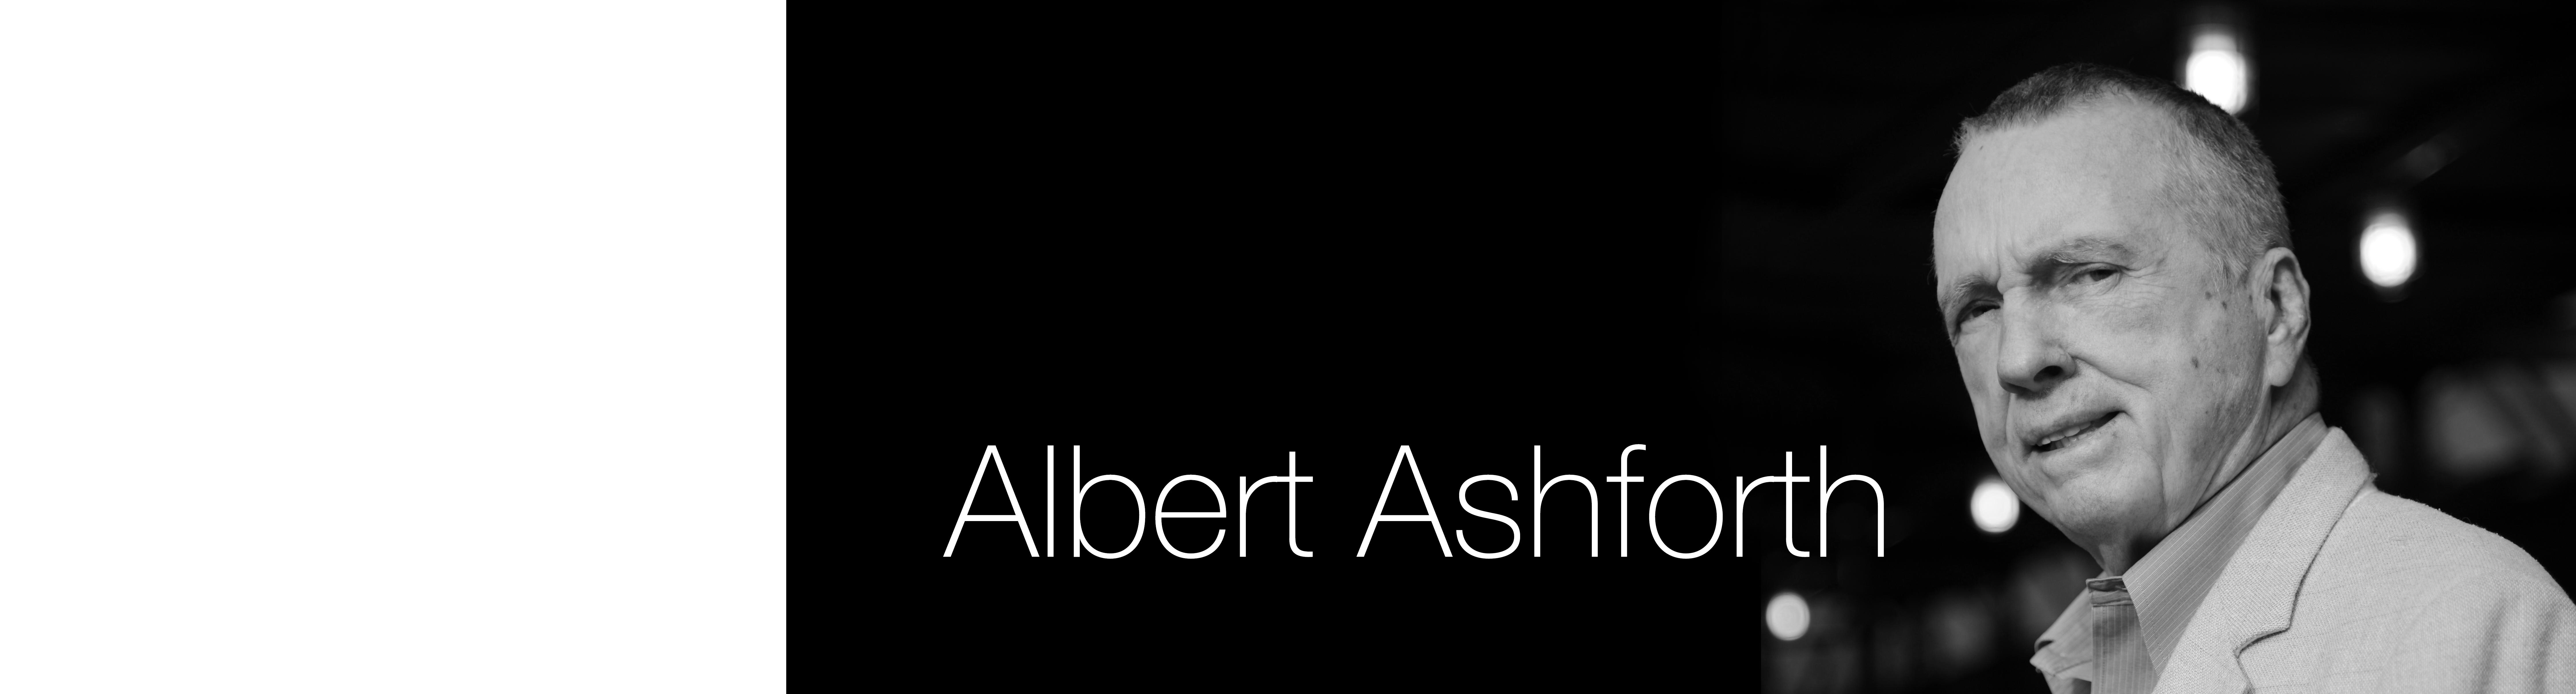 Albert Ashforth Logo